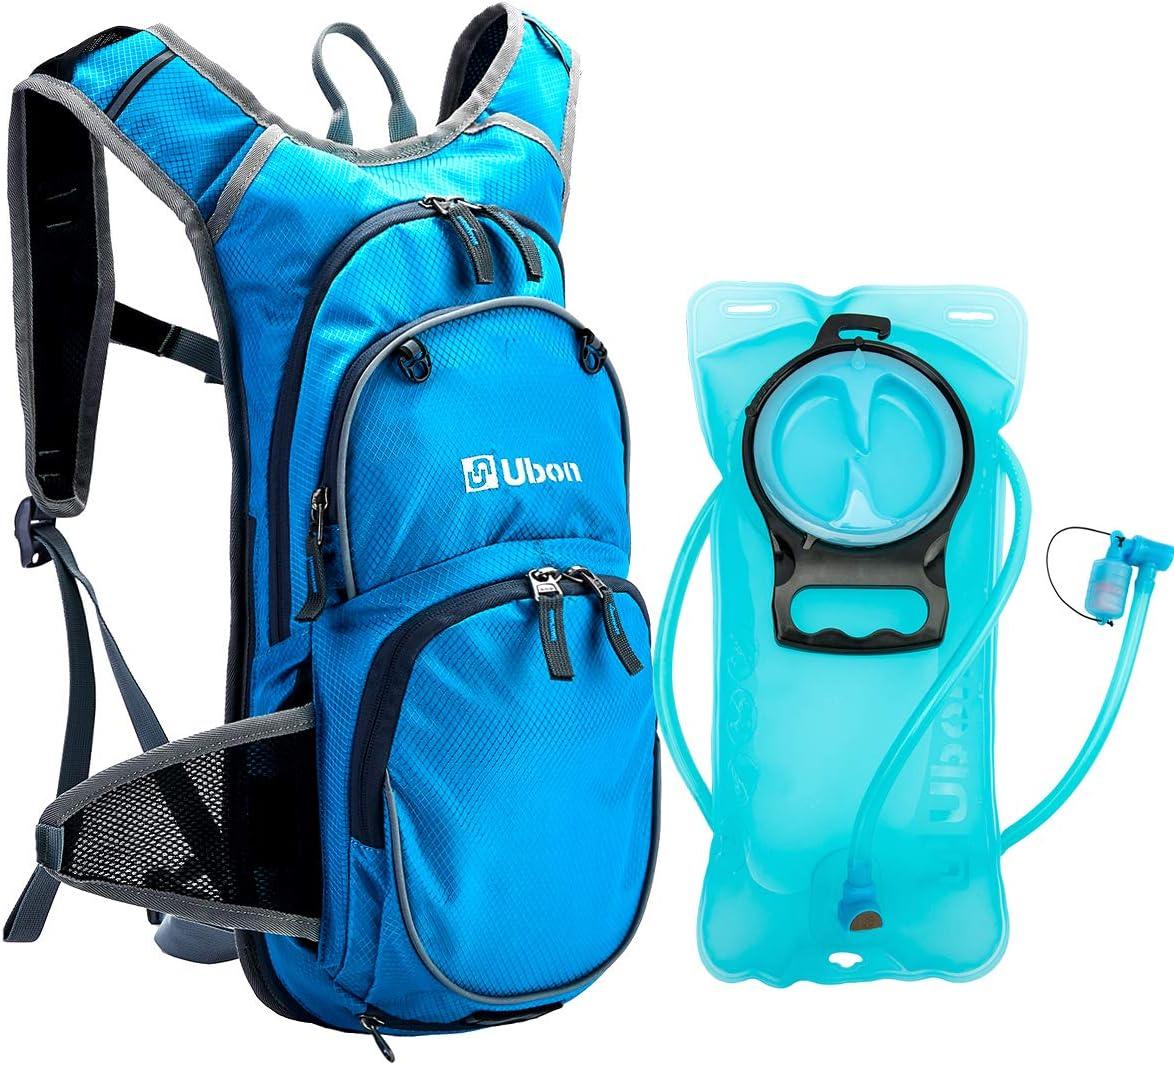 Ubon Lightweight Hydration Backpack with 2L BPA Free Bladder and Helmet Holder